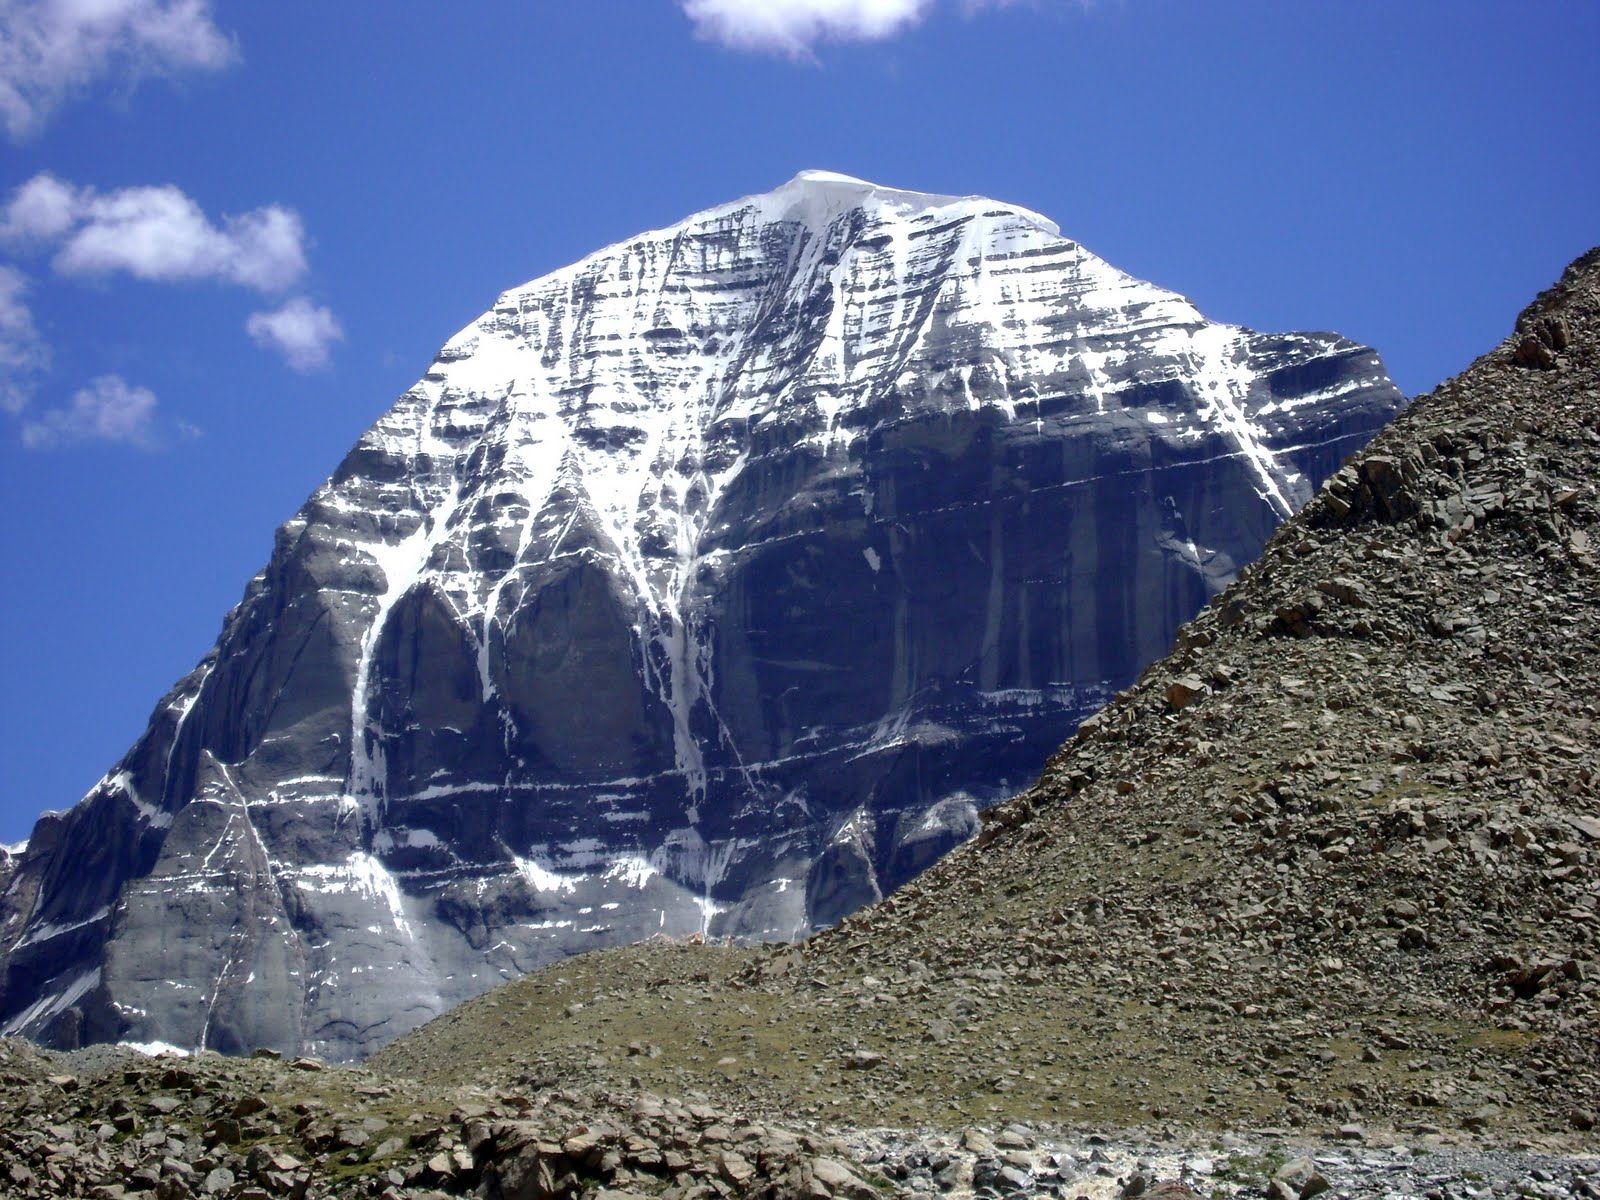 Kailash mansarovar ii domestic travels - Kailash mansarovar om ...